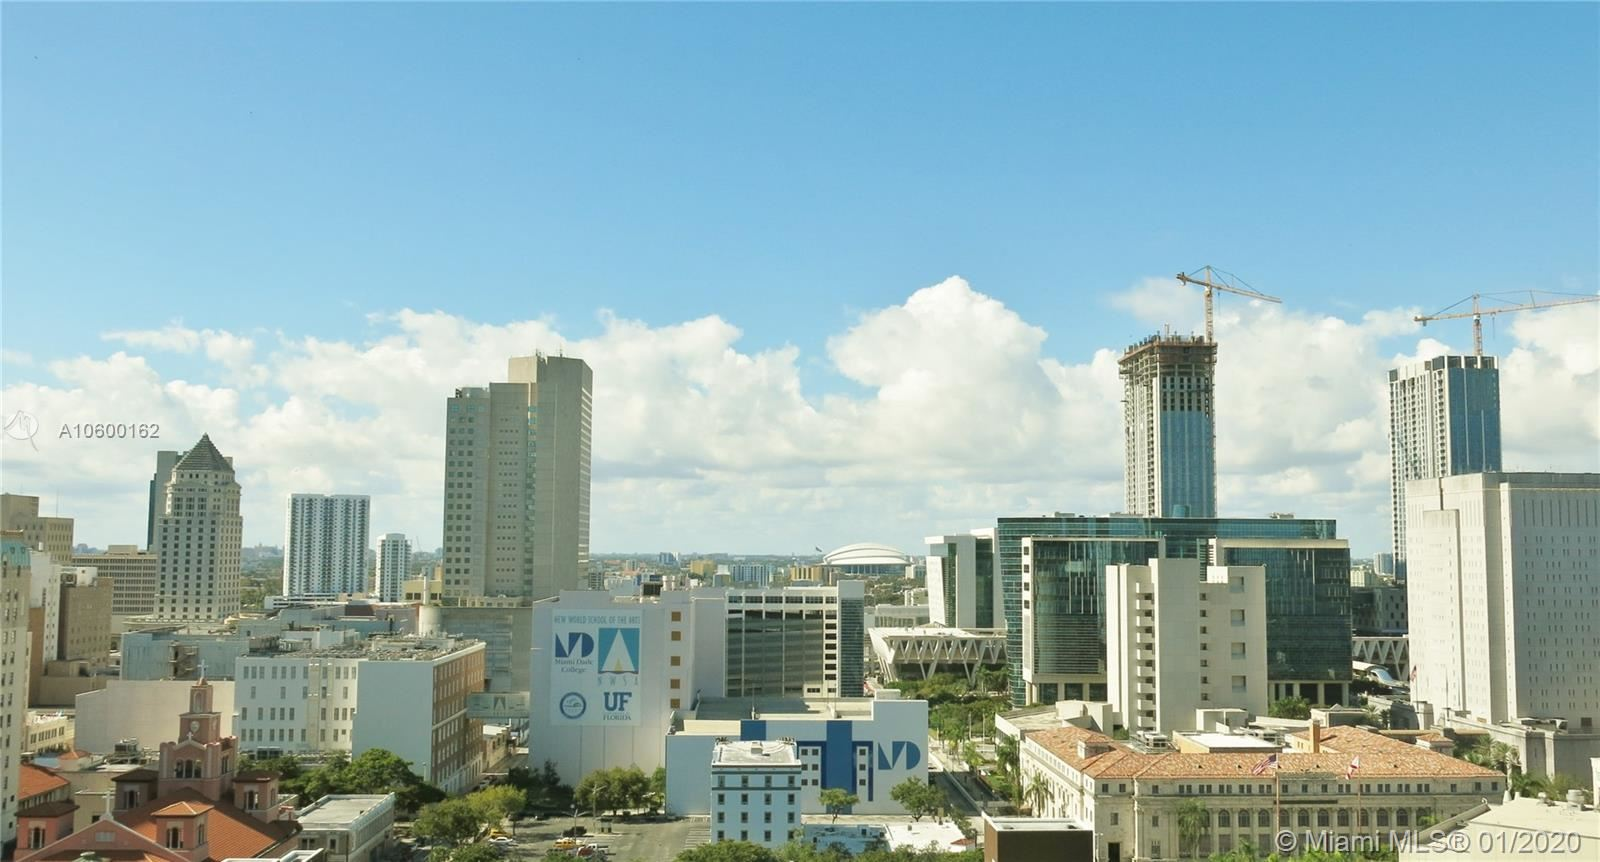 234 NE 3rd St #1907, Miami, FL 33132 - #: A10600162